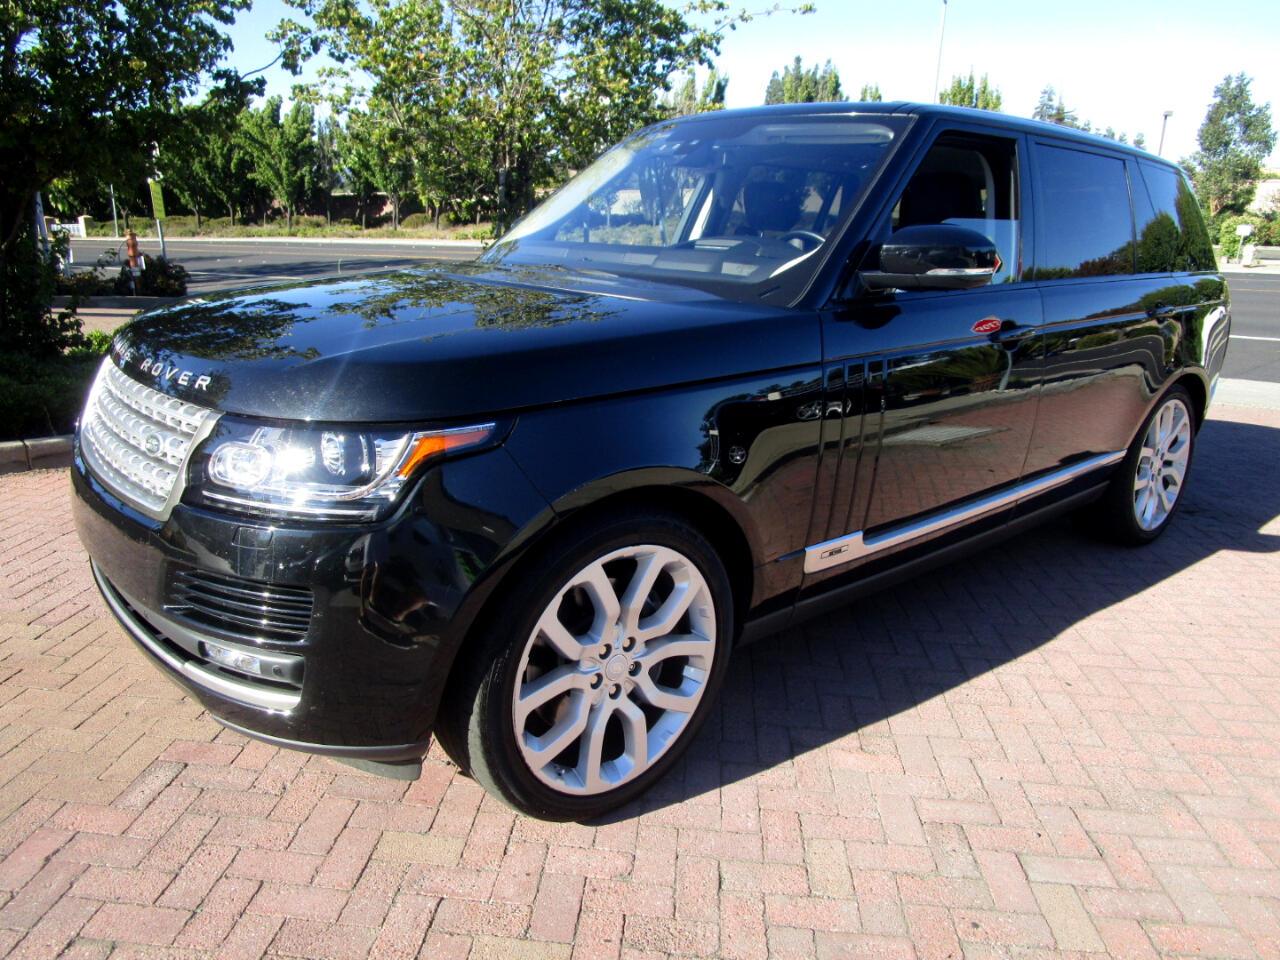 2016 Land Rover Range Rover S/C 5.0 V8*LONG WHEEL BASE**DRIVER ASSIST*HEAT/AC